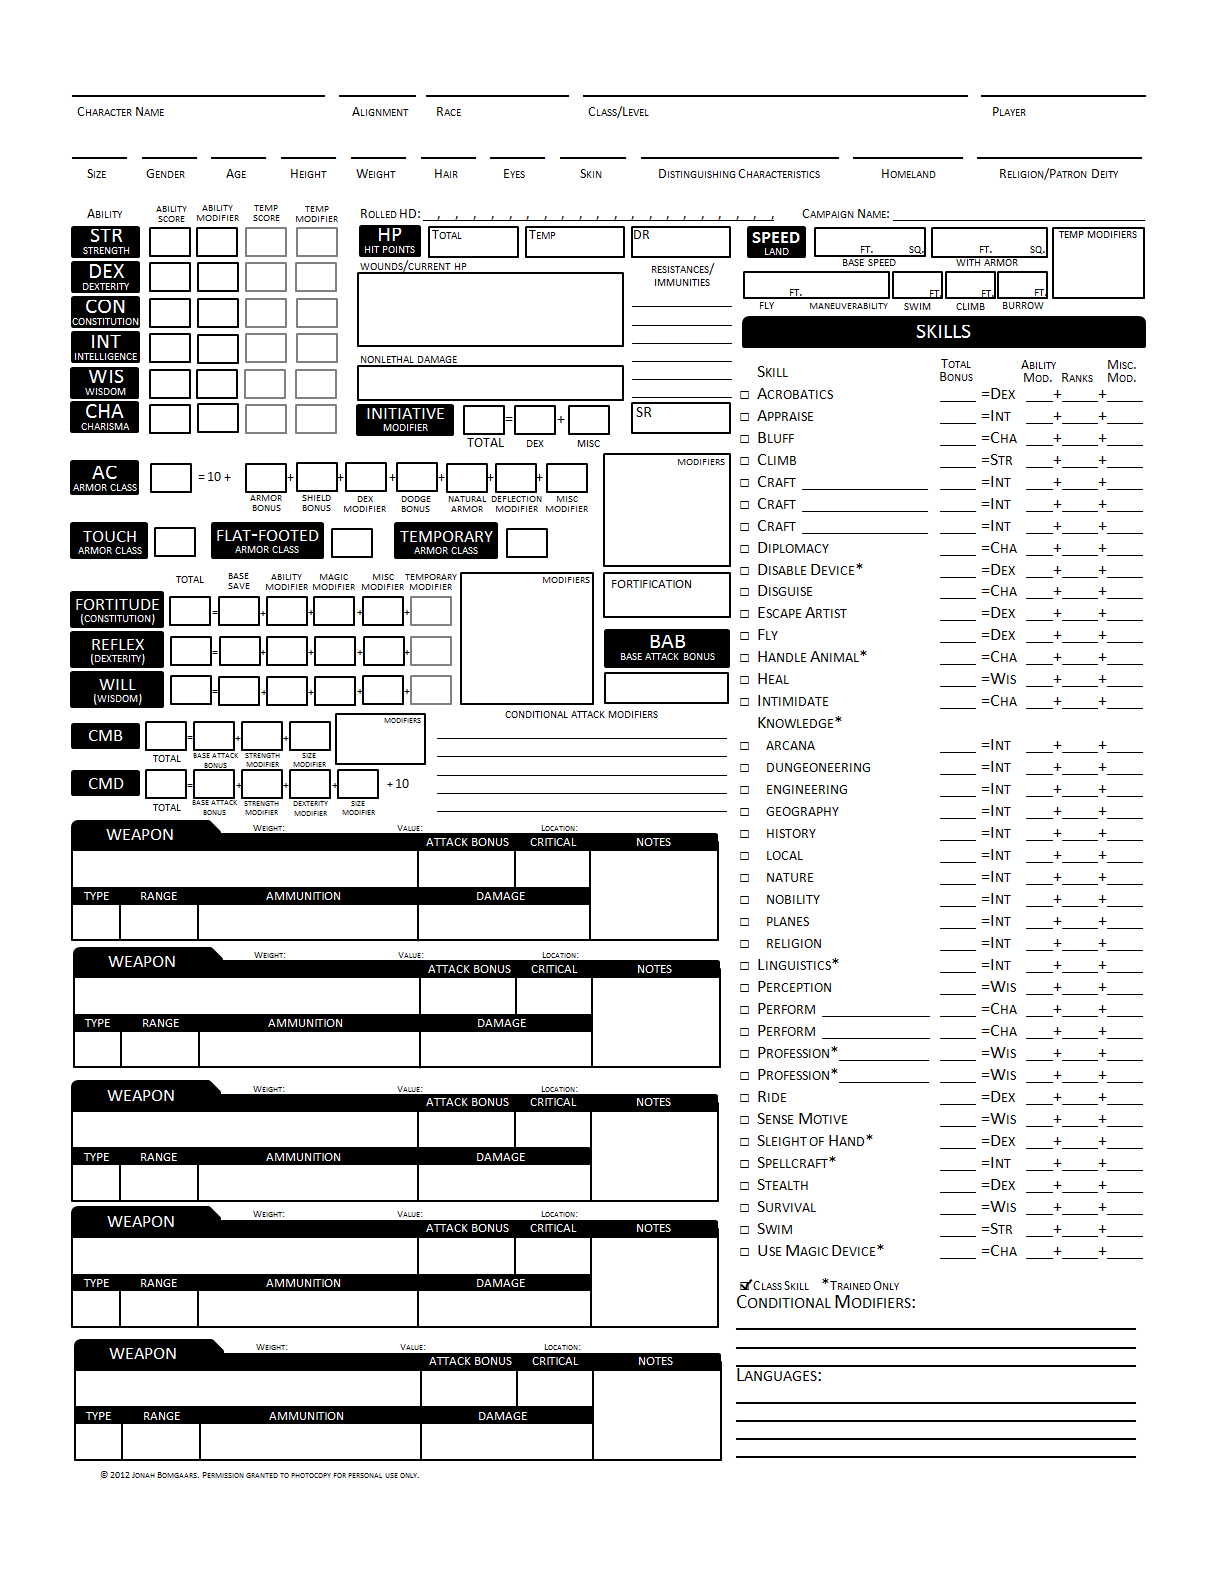 Pathfinder Companion Character Sheet Printable | Wiring Diagram Database